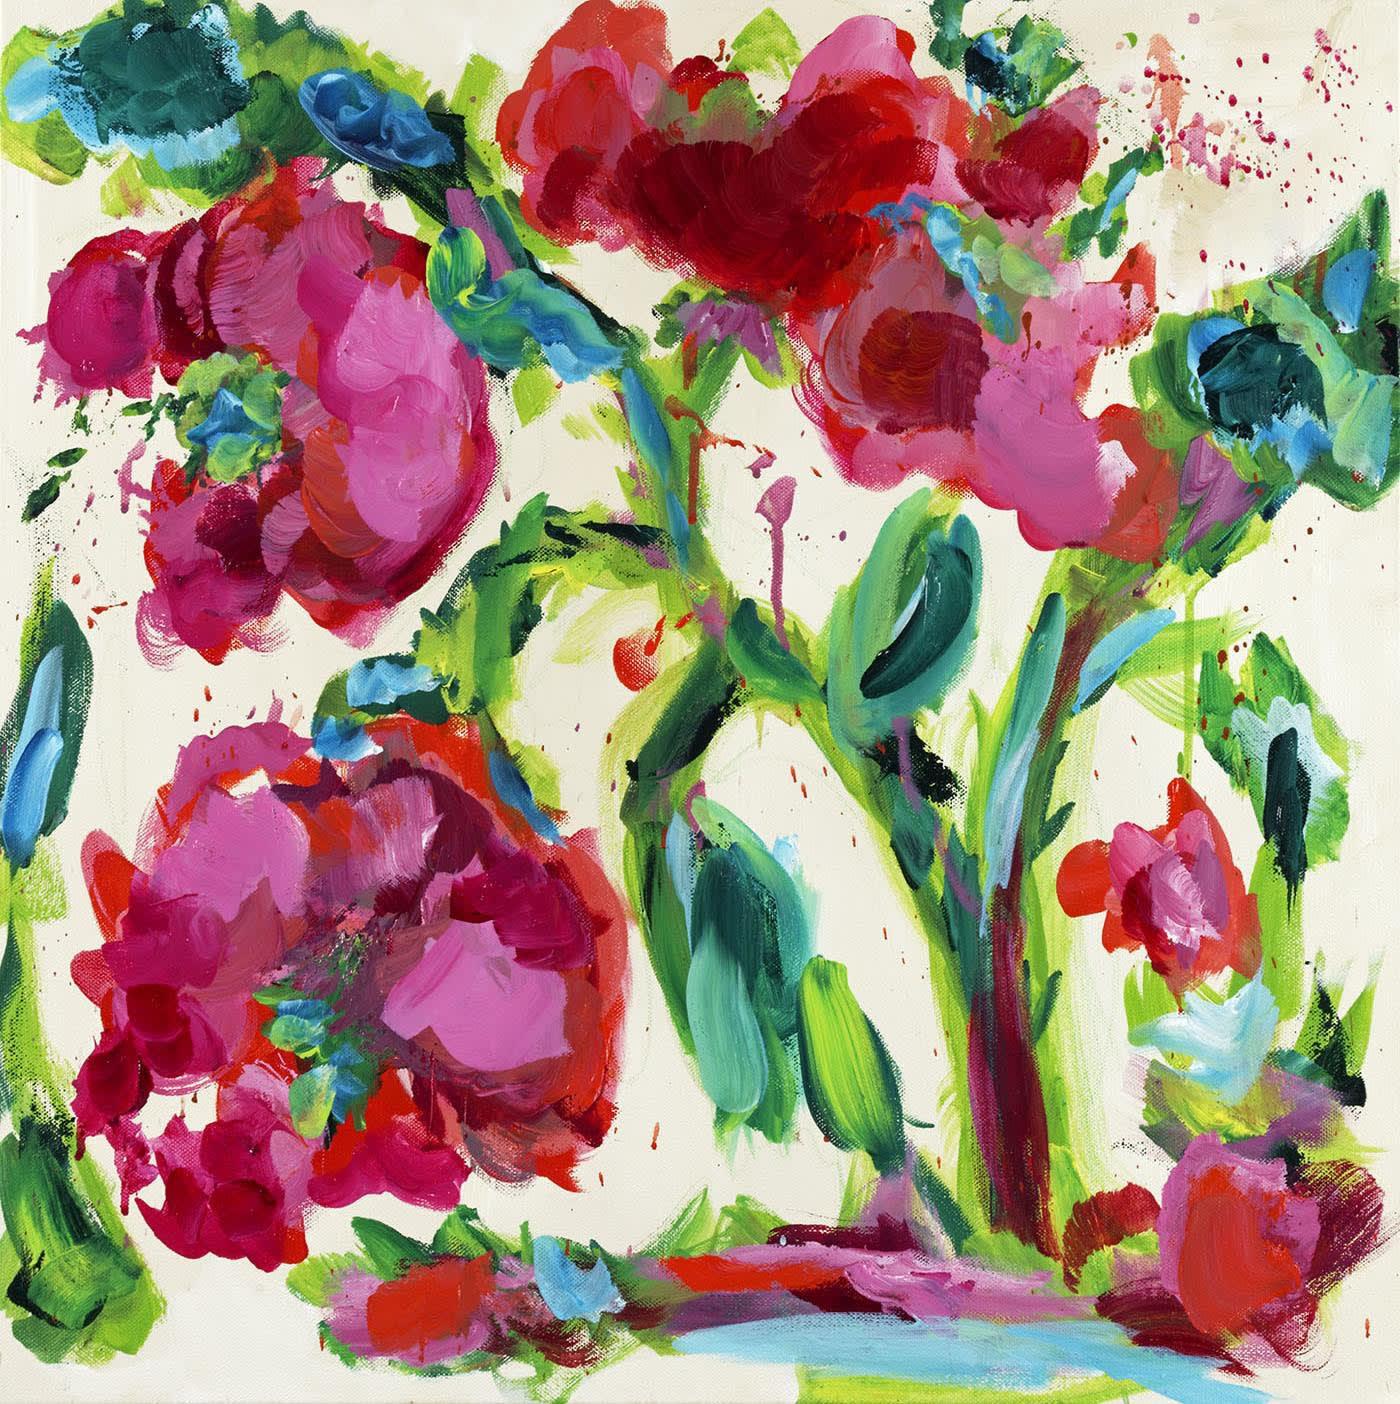 Judy Allen, Love is in the Air